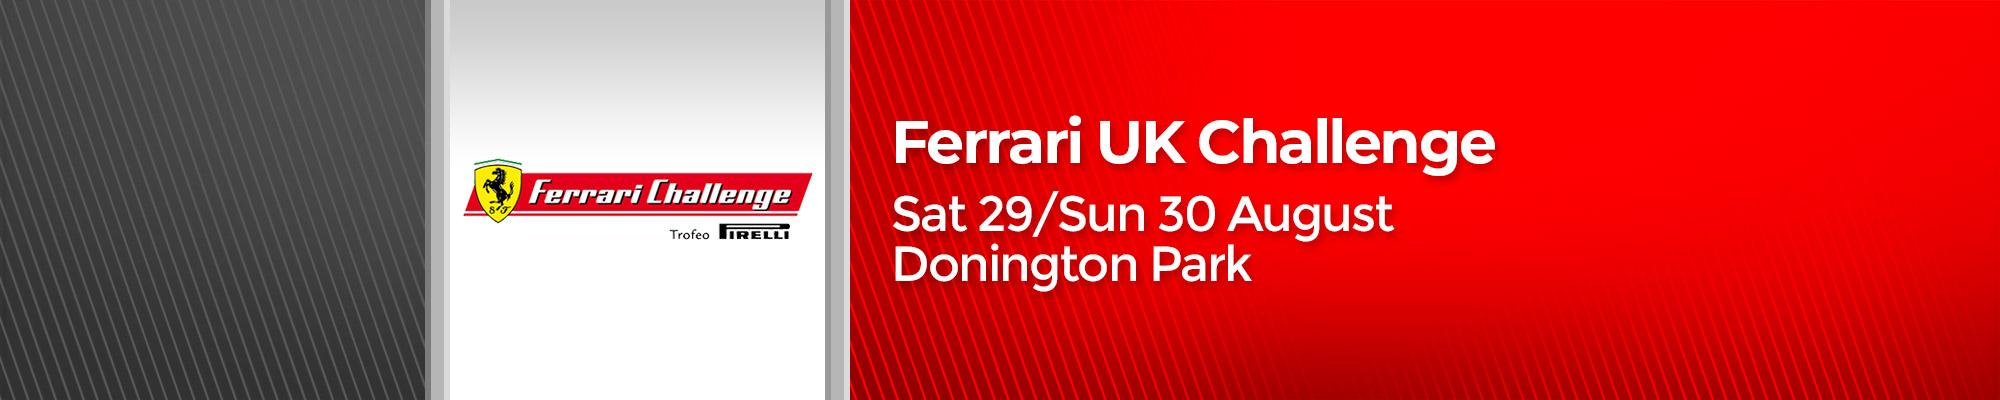 Ferrari Challenge UK - POSTPONED